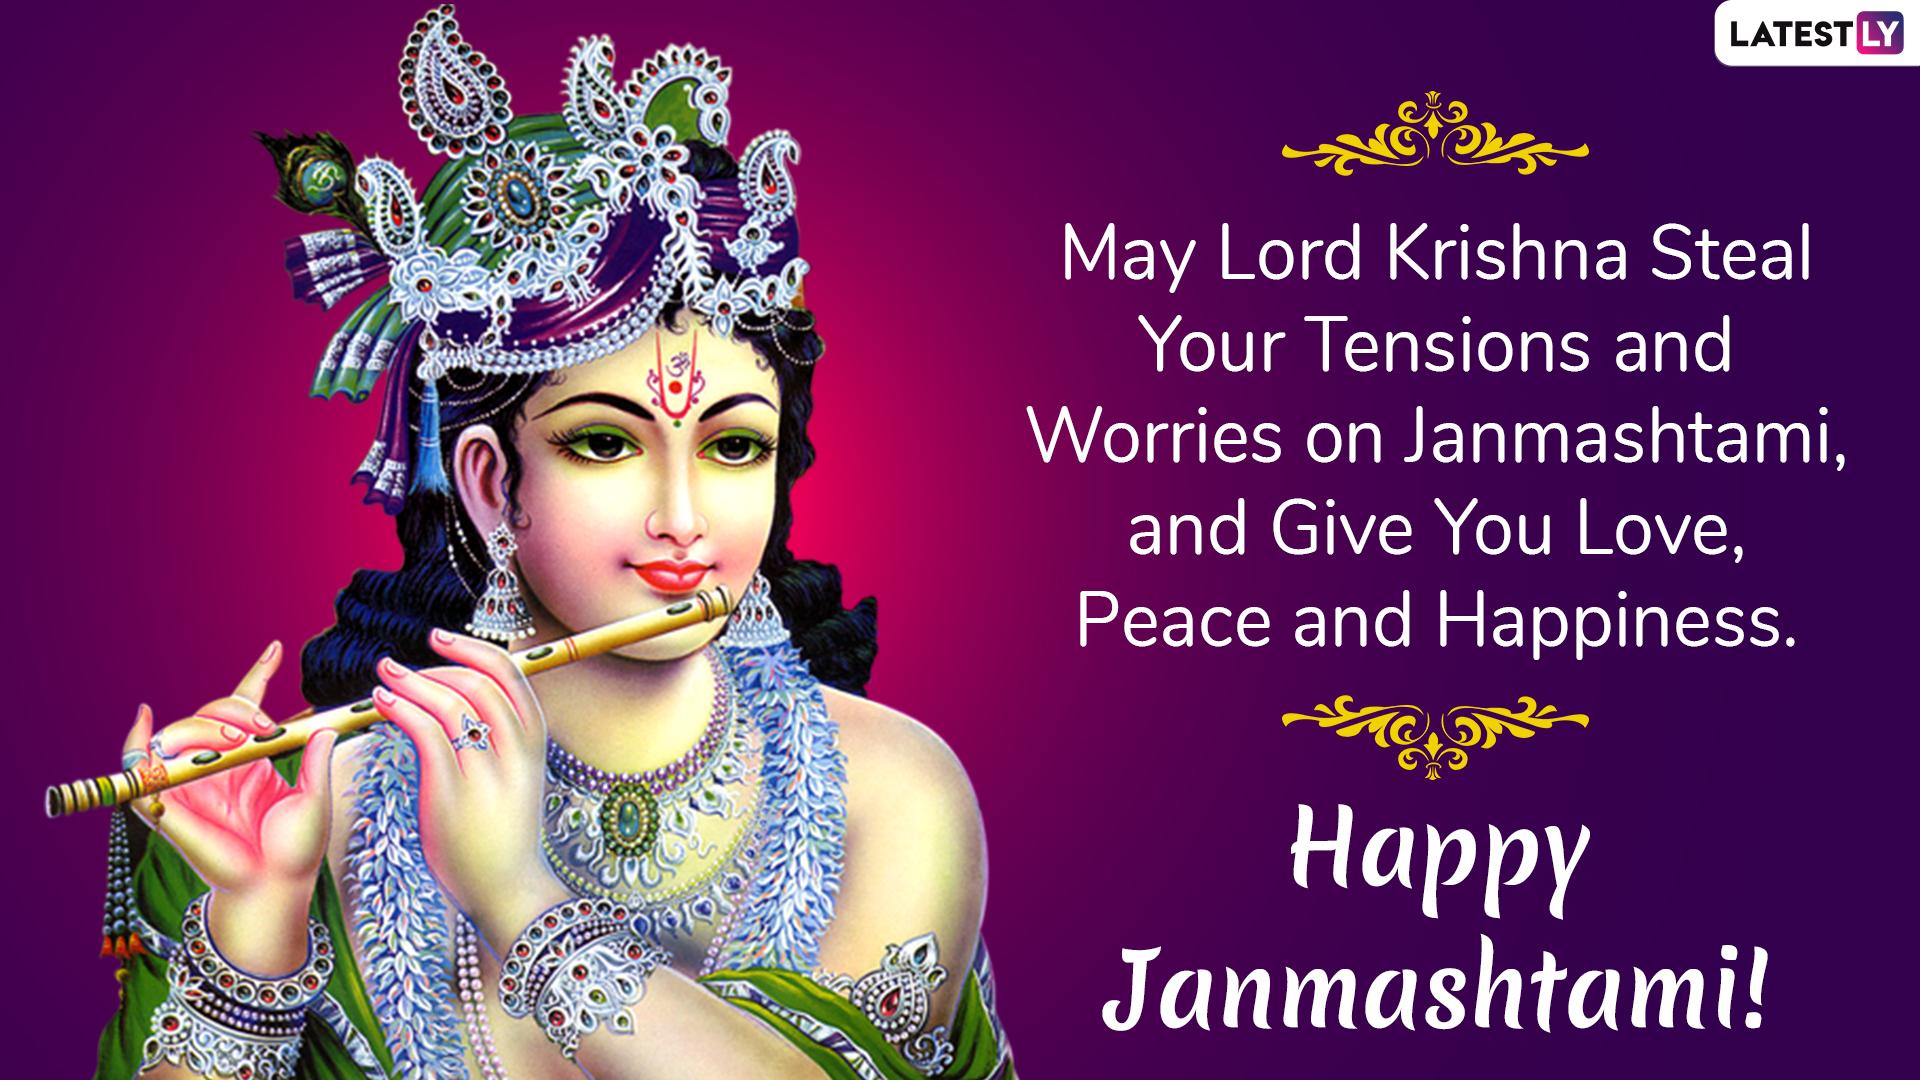 Happy Janmashtami 2019 Wishes And Messages: WhatsApp